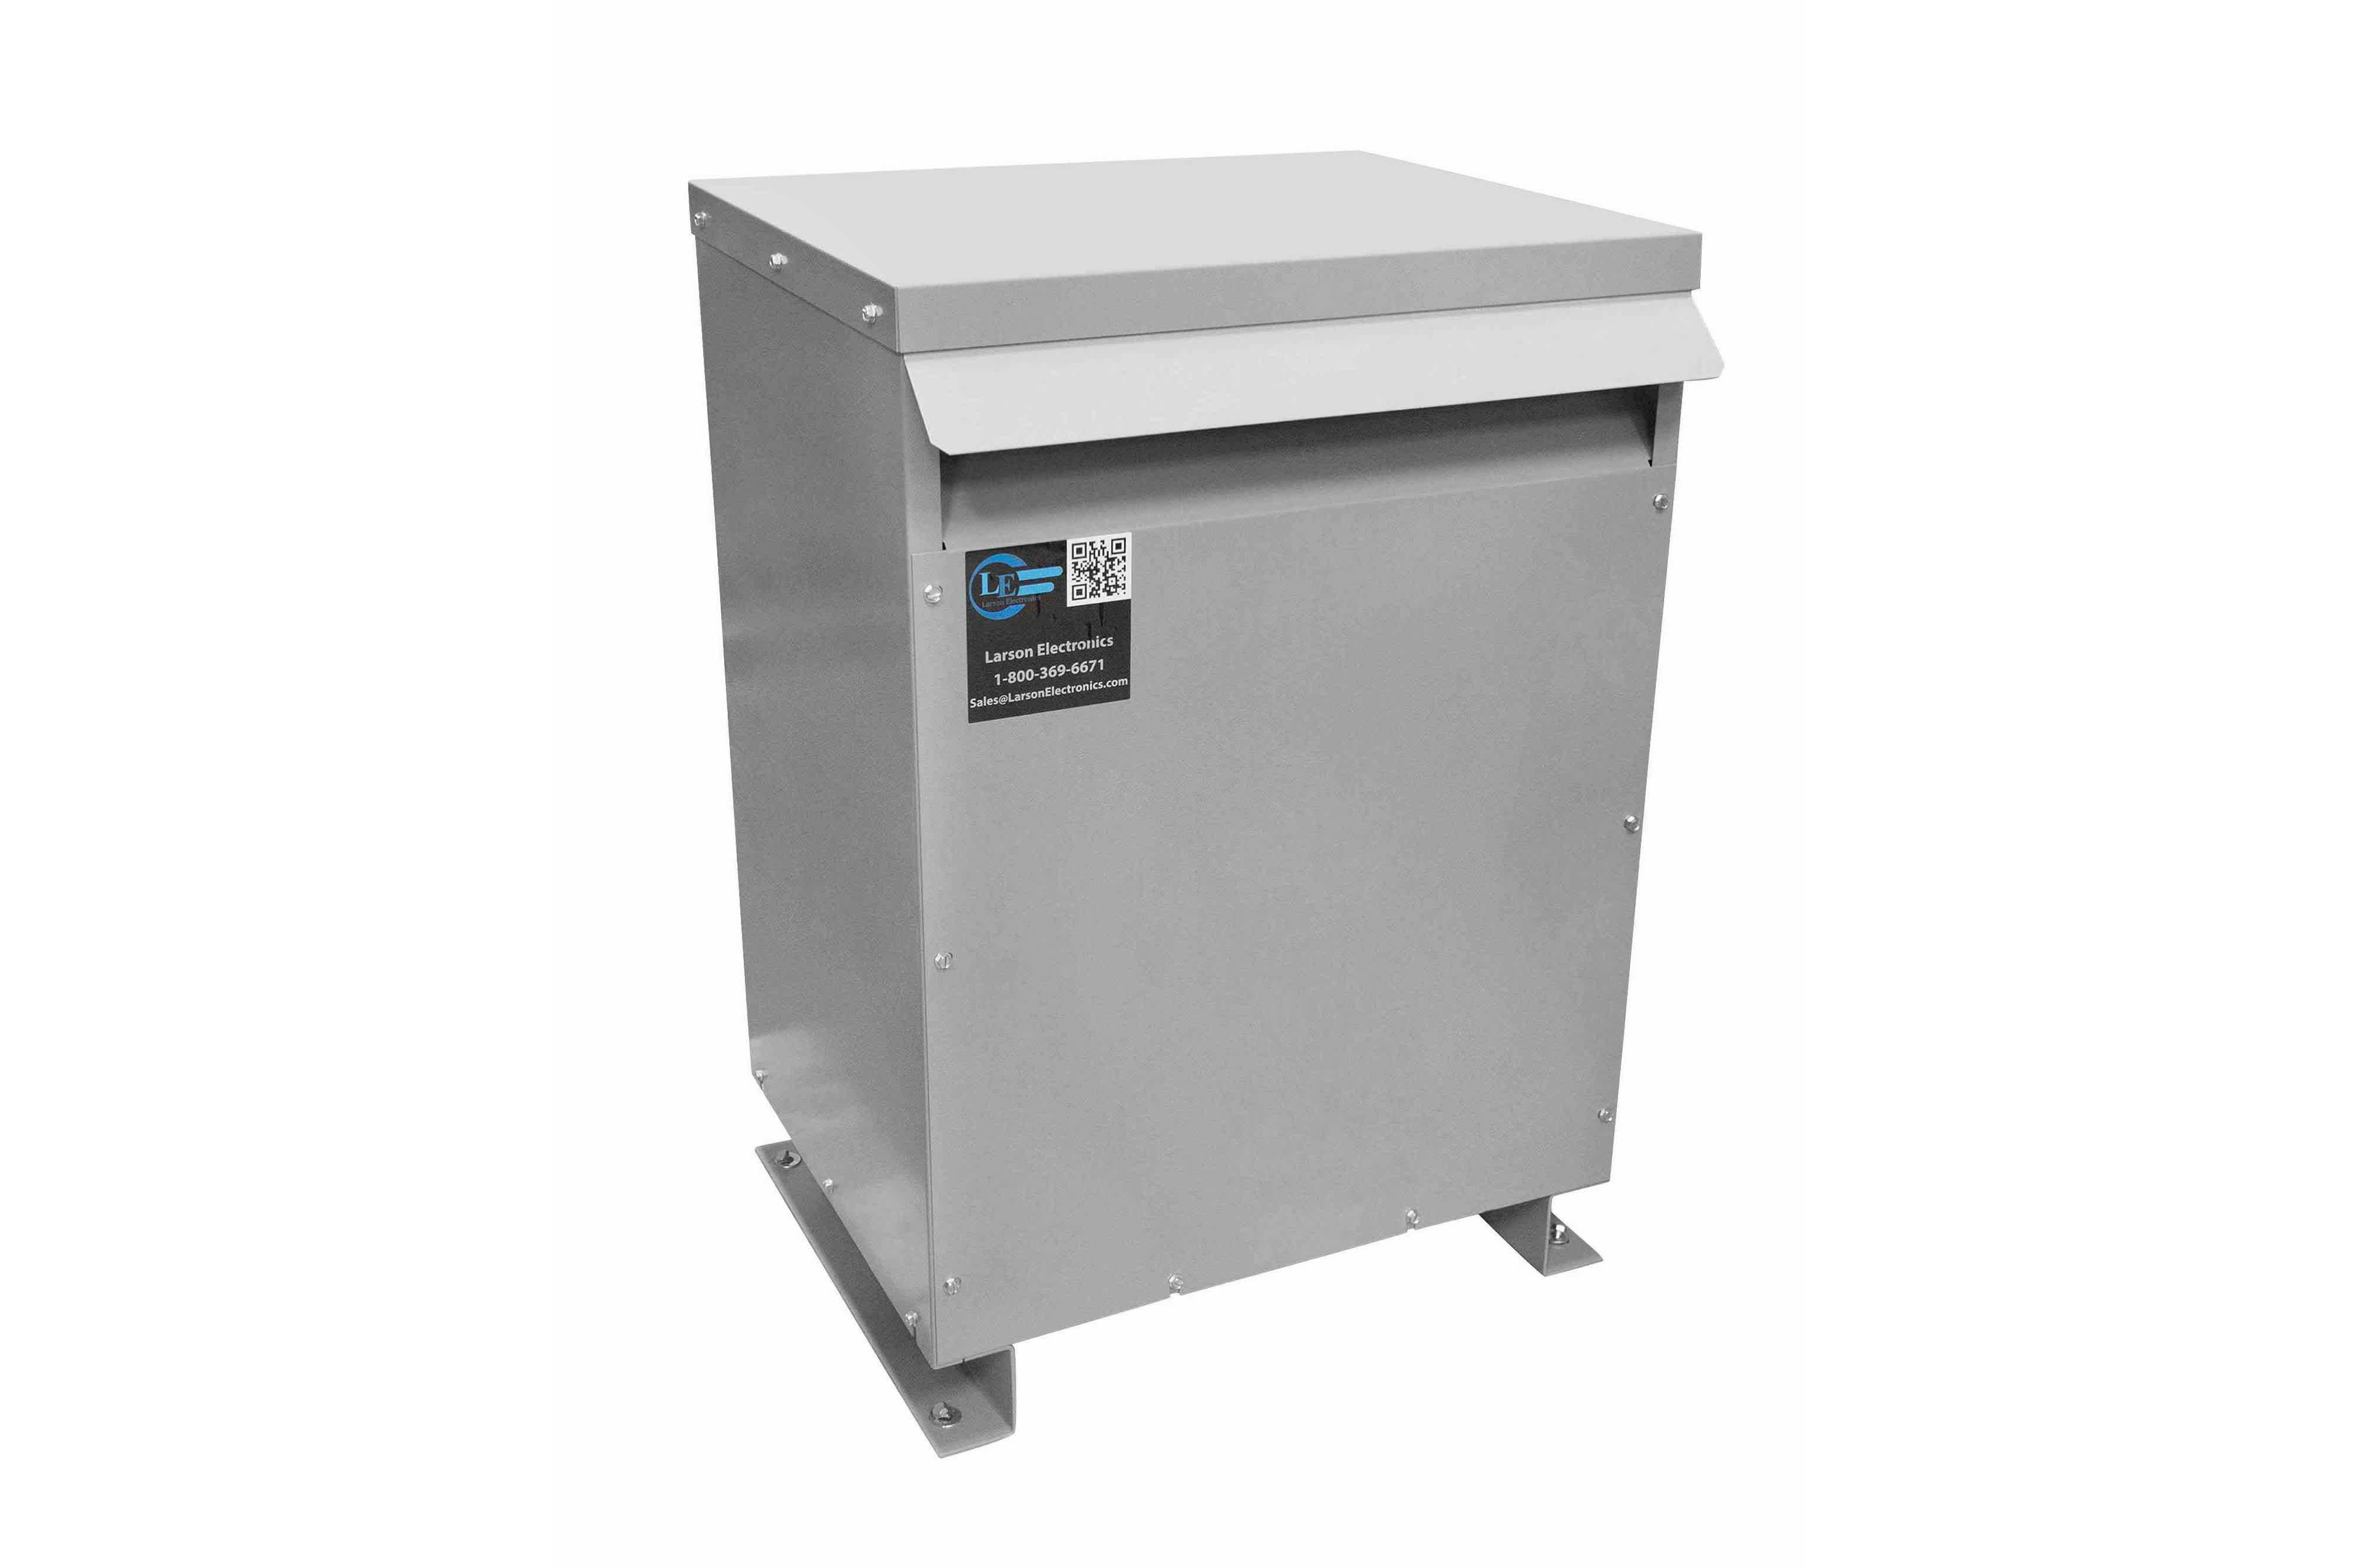 110 kVA 3PH Isolation Transformer, 600V Wye Primary, 380Y/220 Wye-N Secondary, N3R, Ventilated, 60 Hz